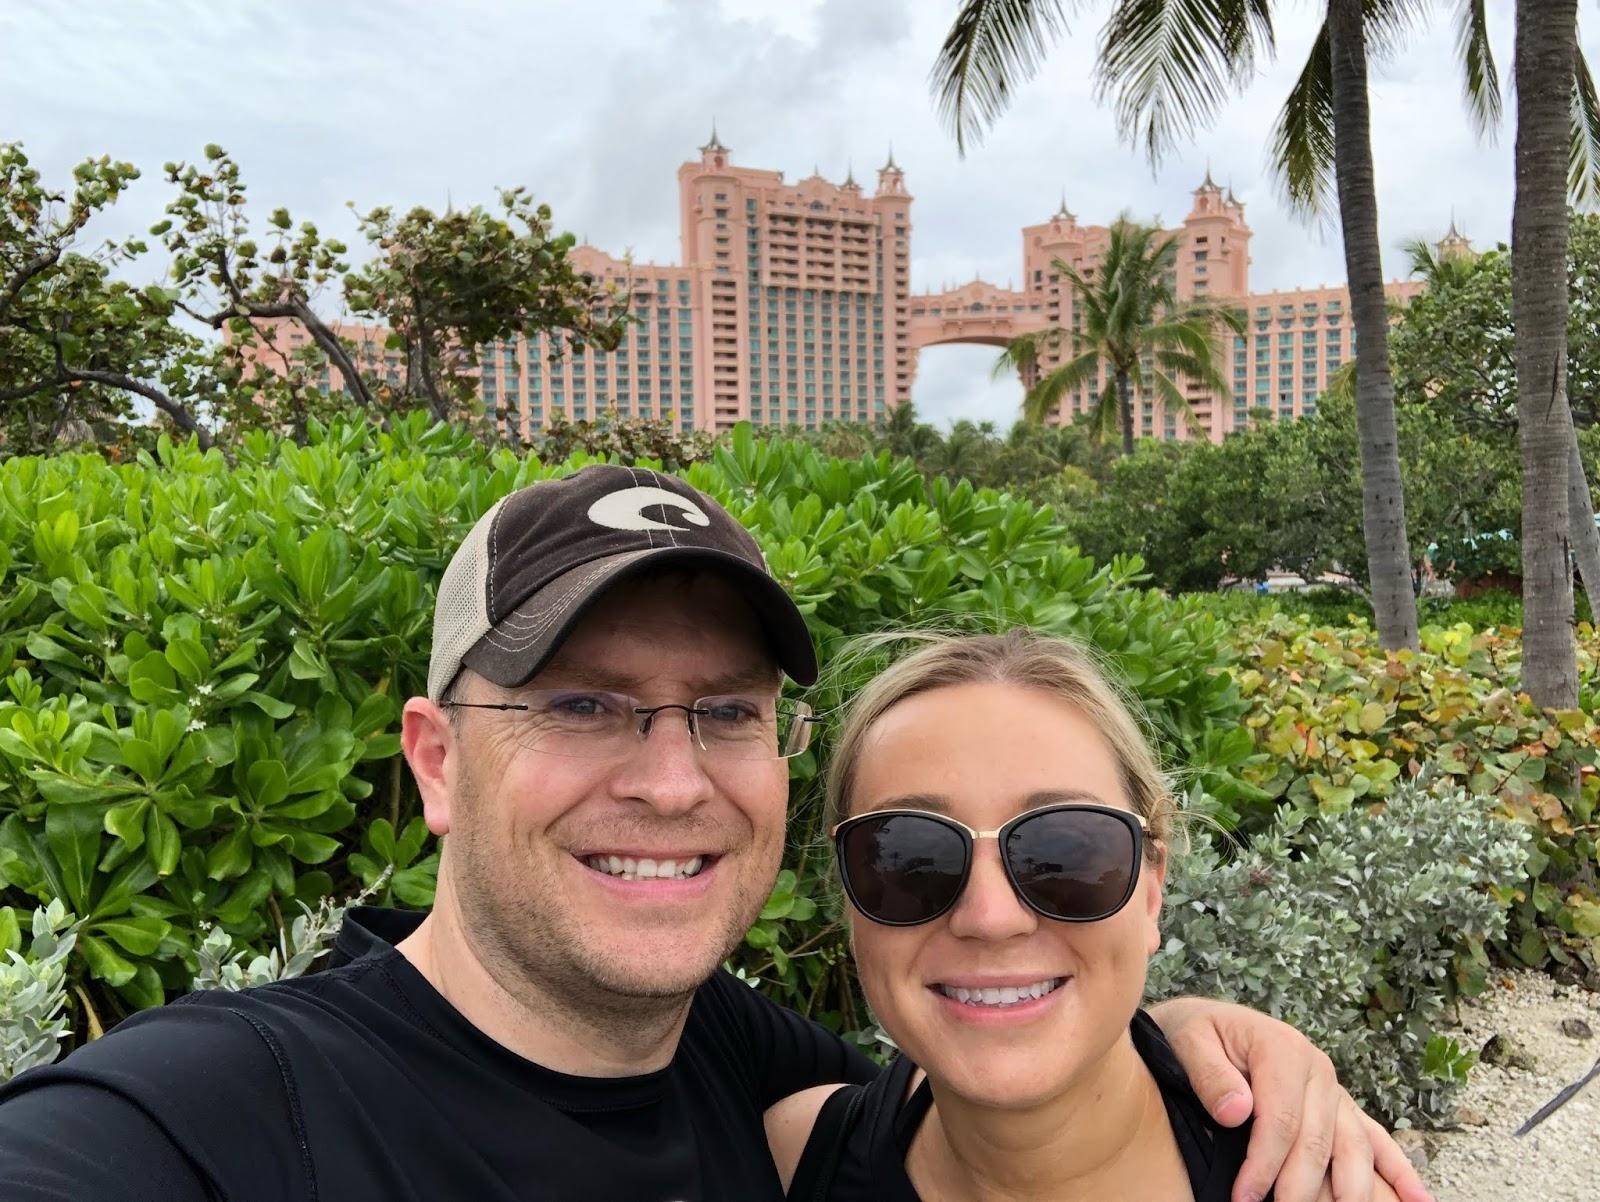 f4ee88d8117 Enjoying Atlantis Resort in the Bahamas.